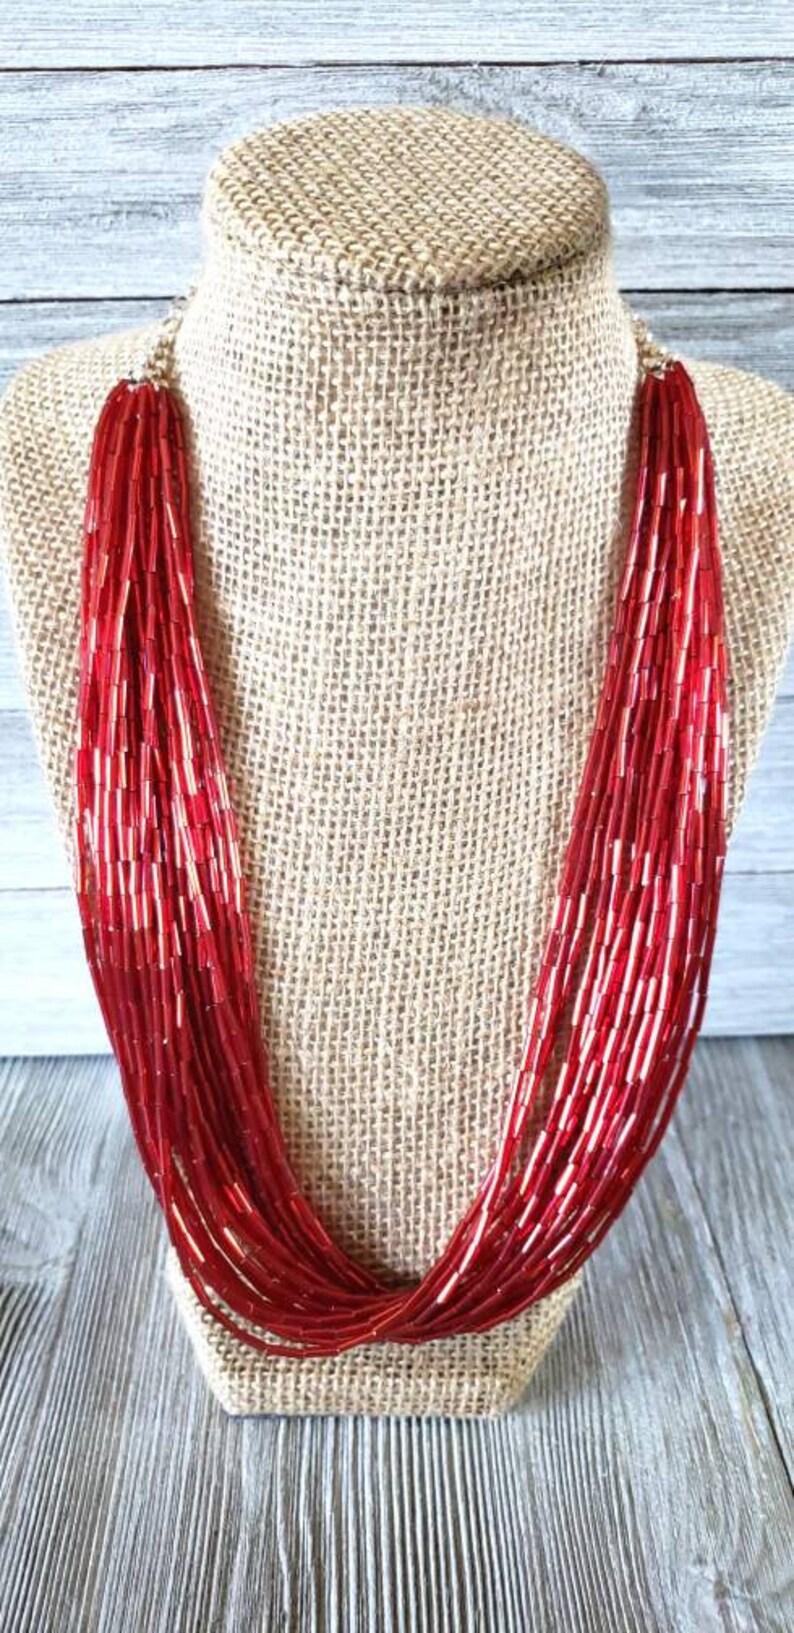 red bugle bead bugle bead multi strand necklace red multi strand necklace Red bugle bead necklace beaded neckla bright red necklace